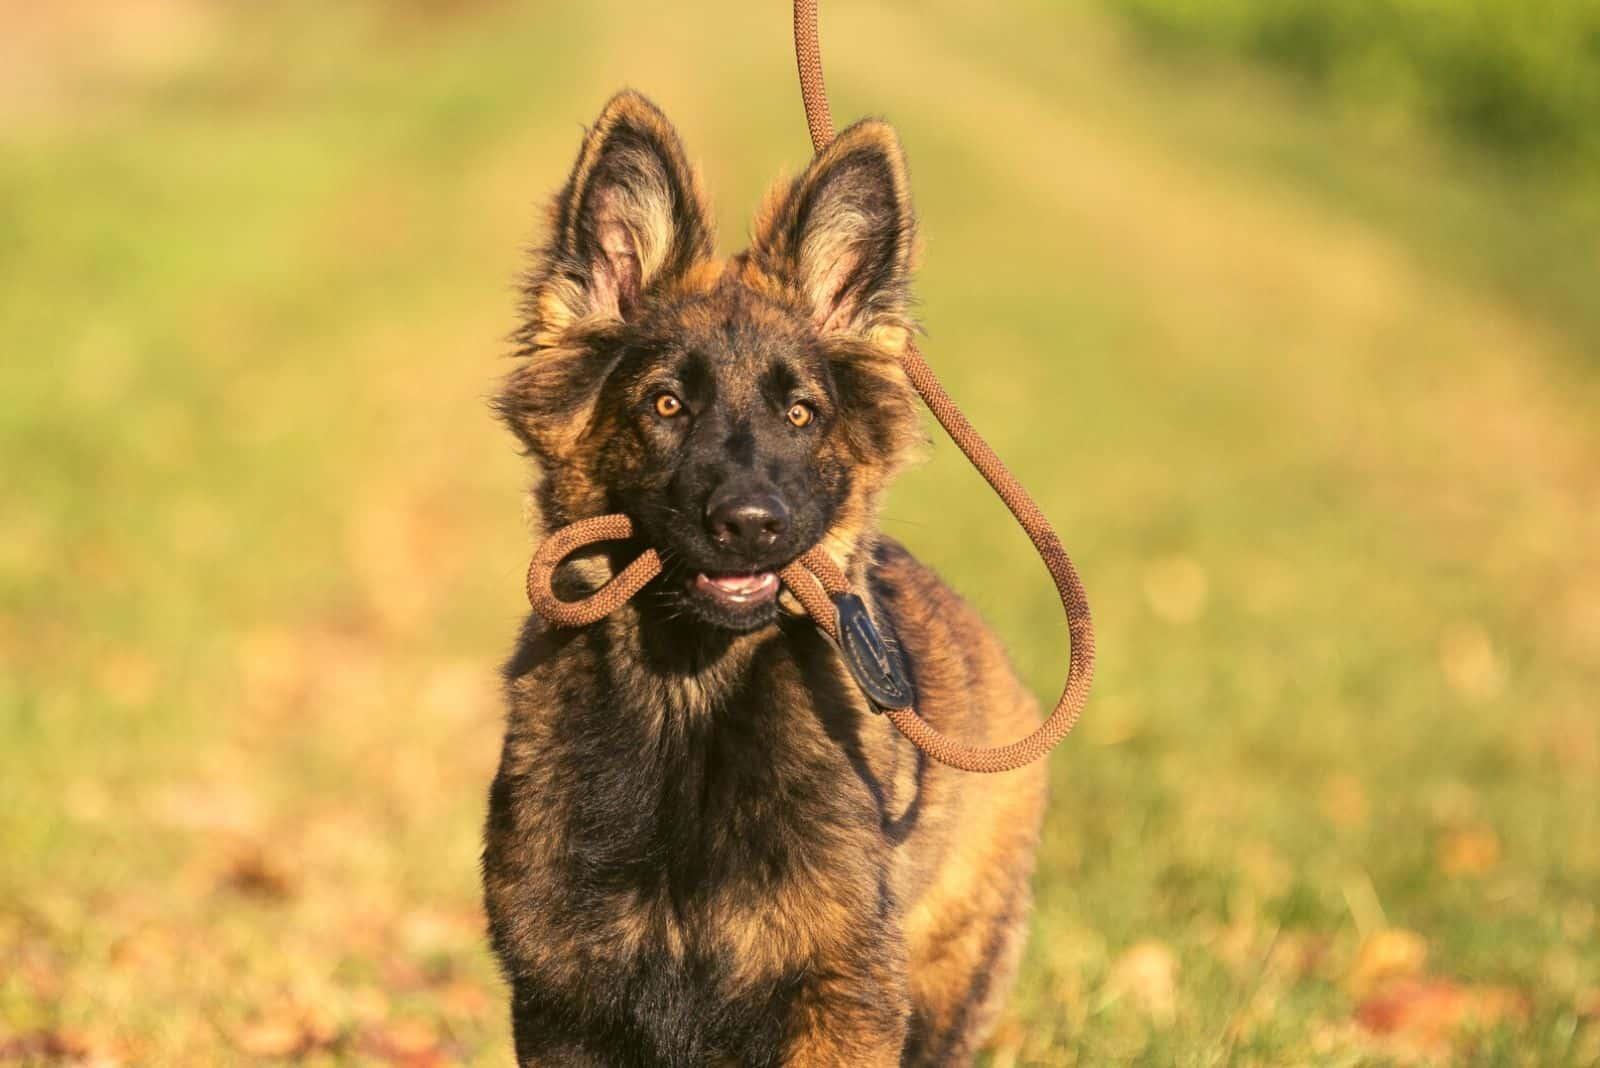 Dark sable longcoated German shepherd puppy carrying his leash